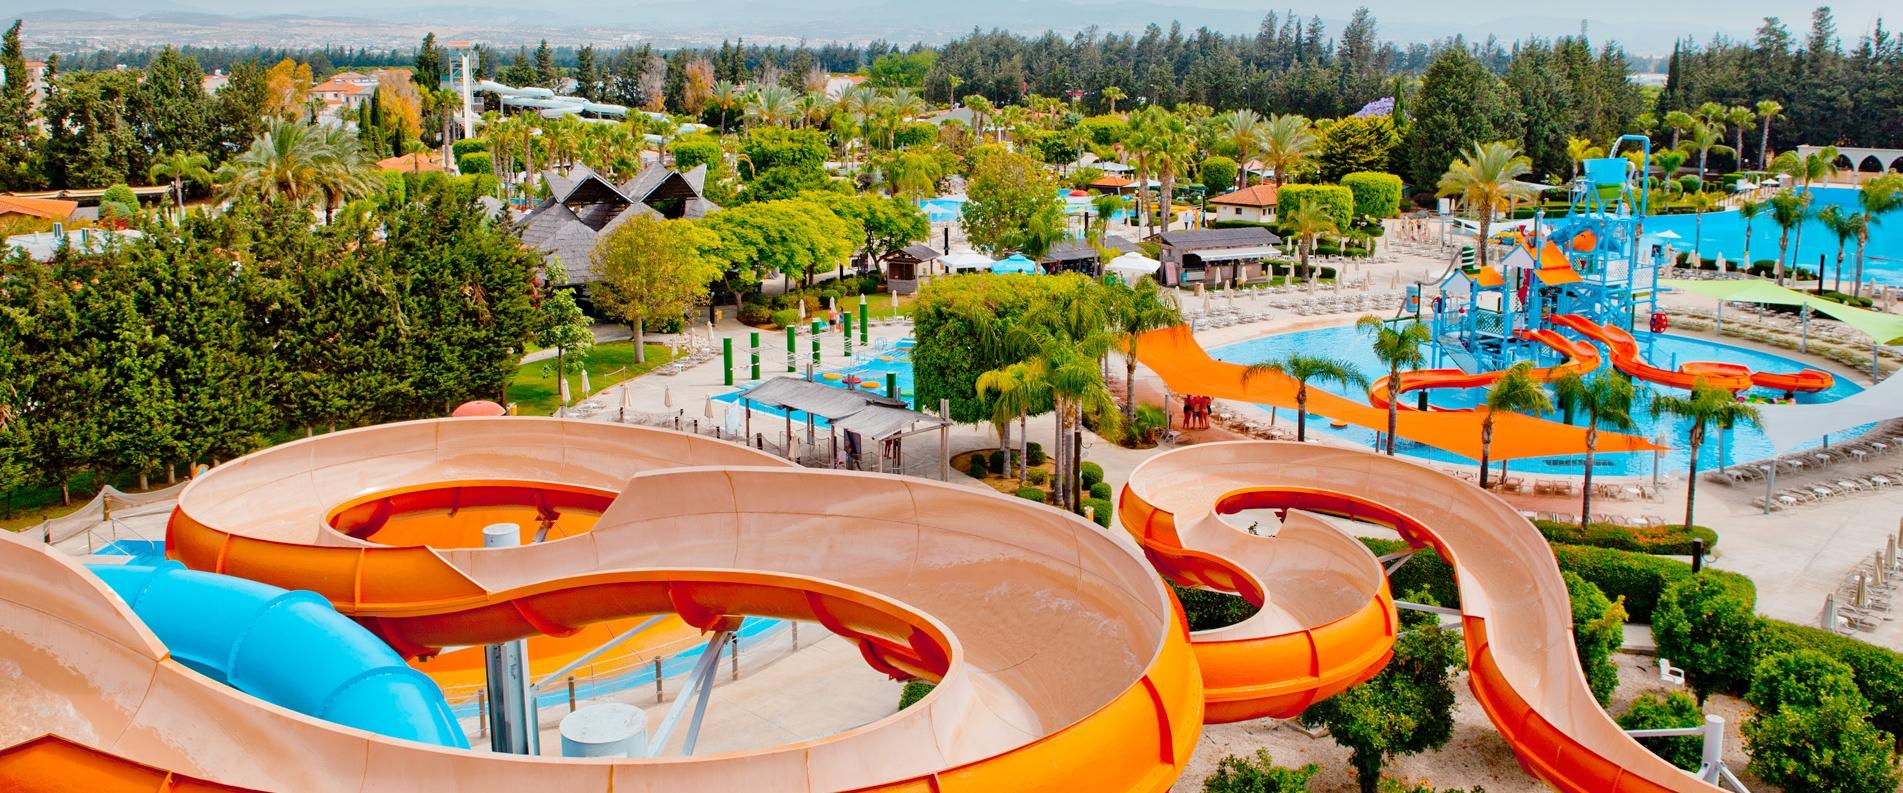 Fasouri Watermania Aquapark in Limassol